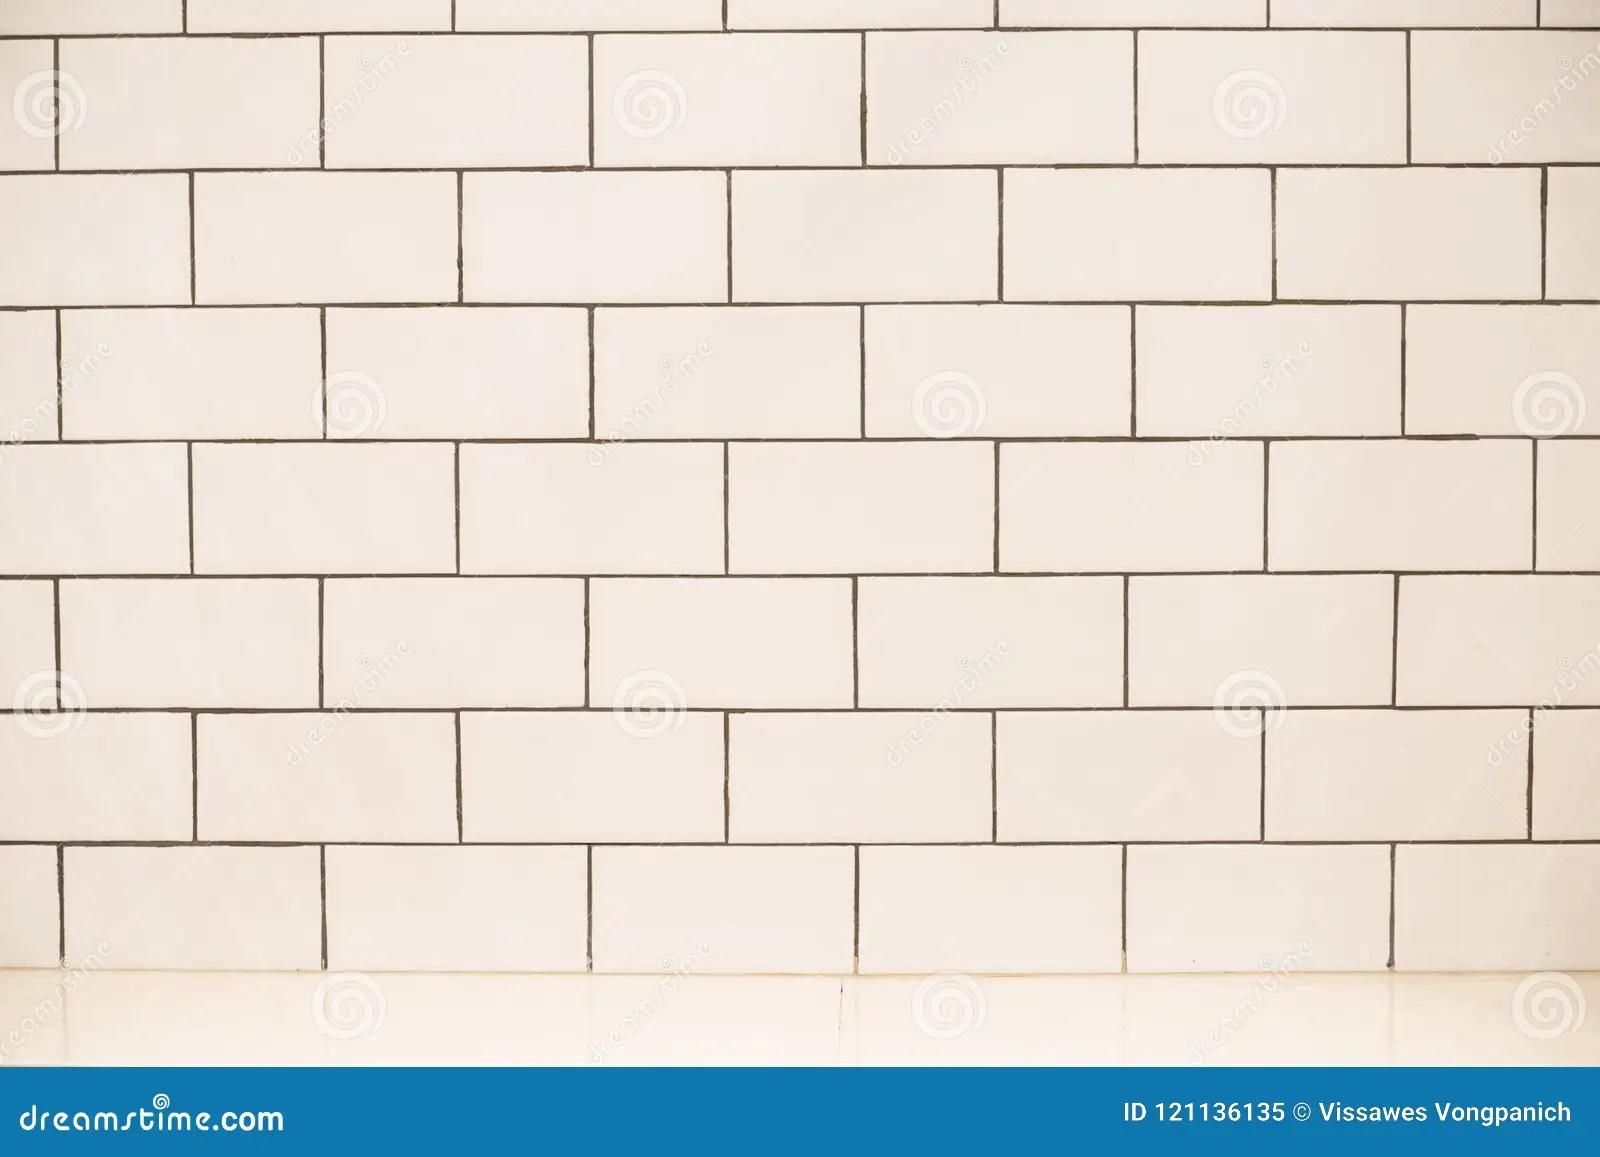 https www dreamstime com space front graphic bathroom tiles background wallpaper bathroom tiles background wallpaper image121136135